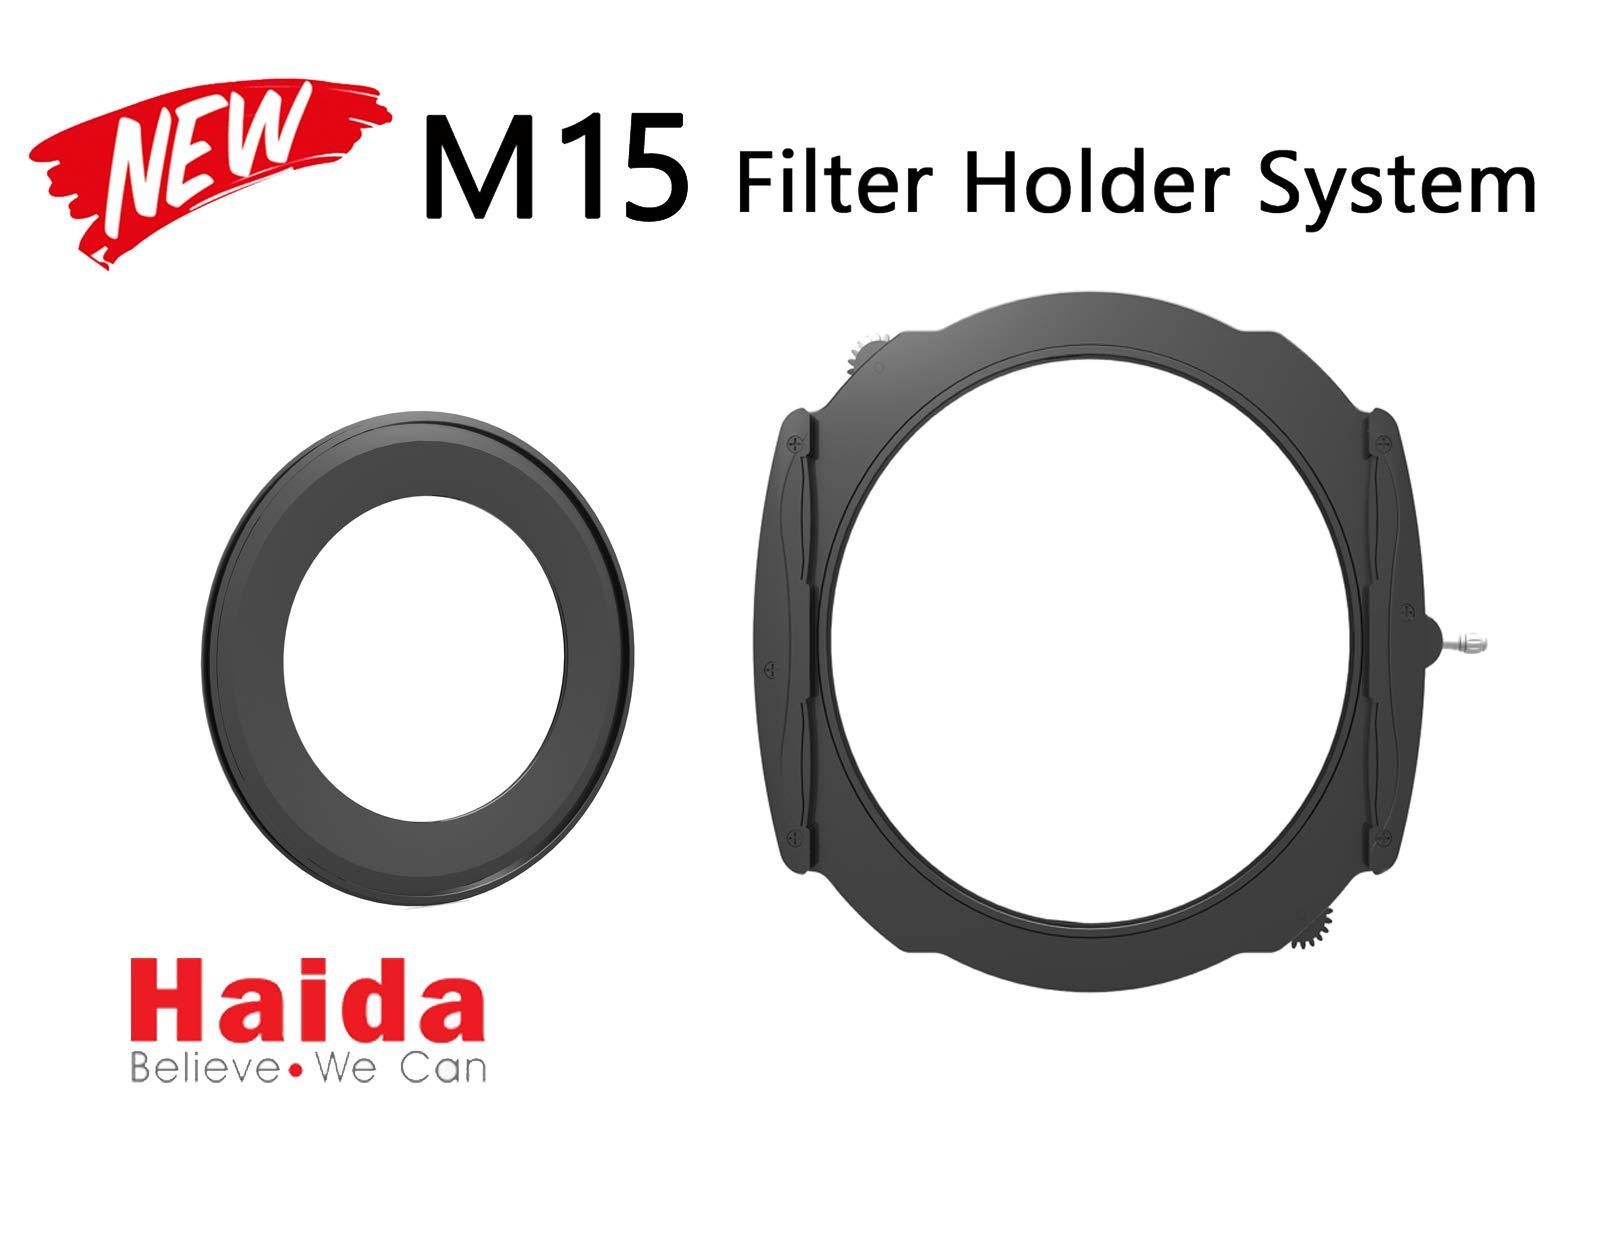 Haida M15 Filter Holder System for Tamron 15-30mm 150mm Filter System